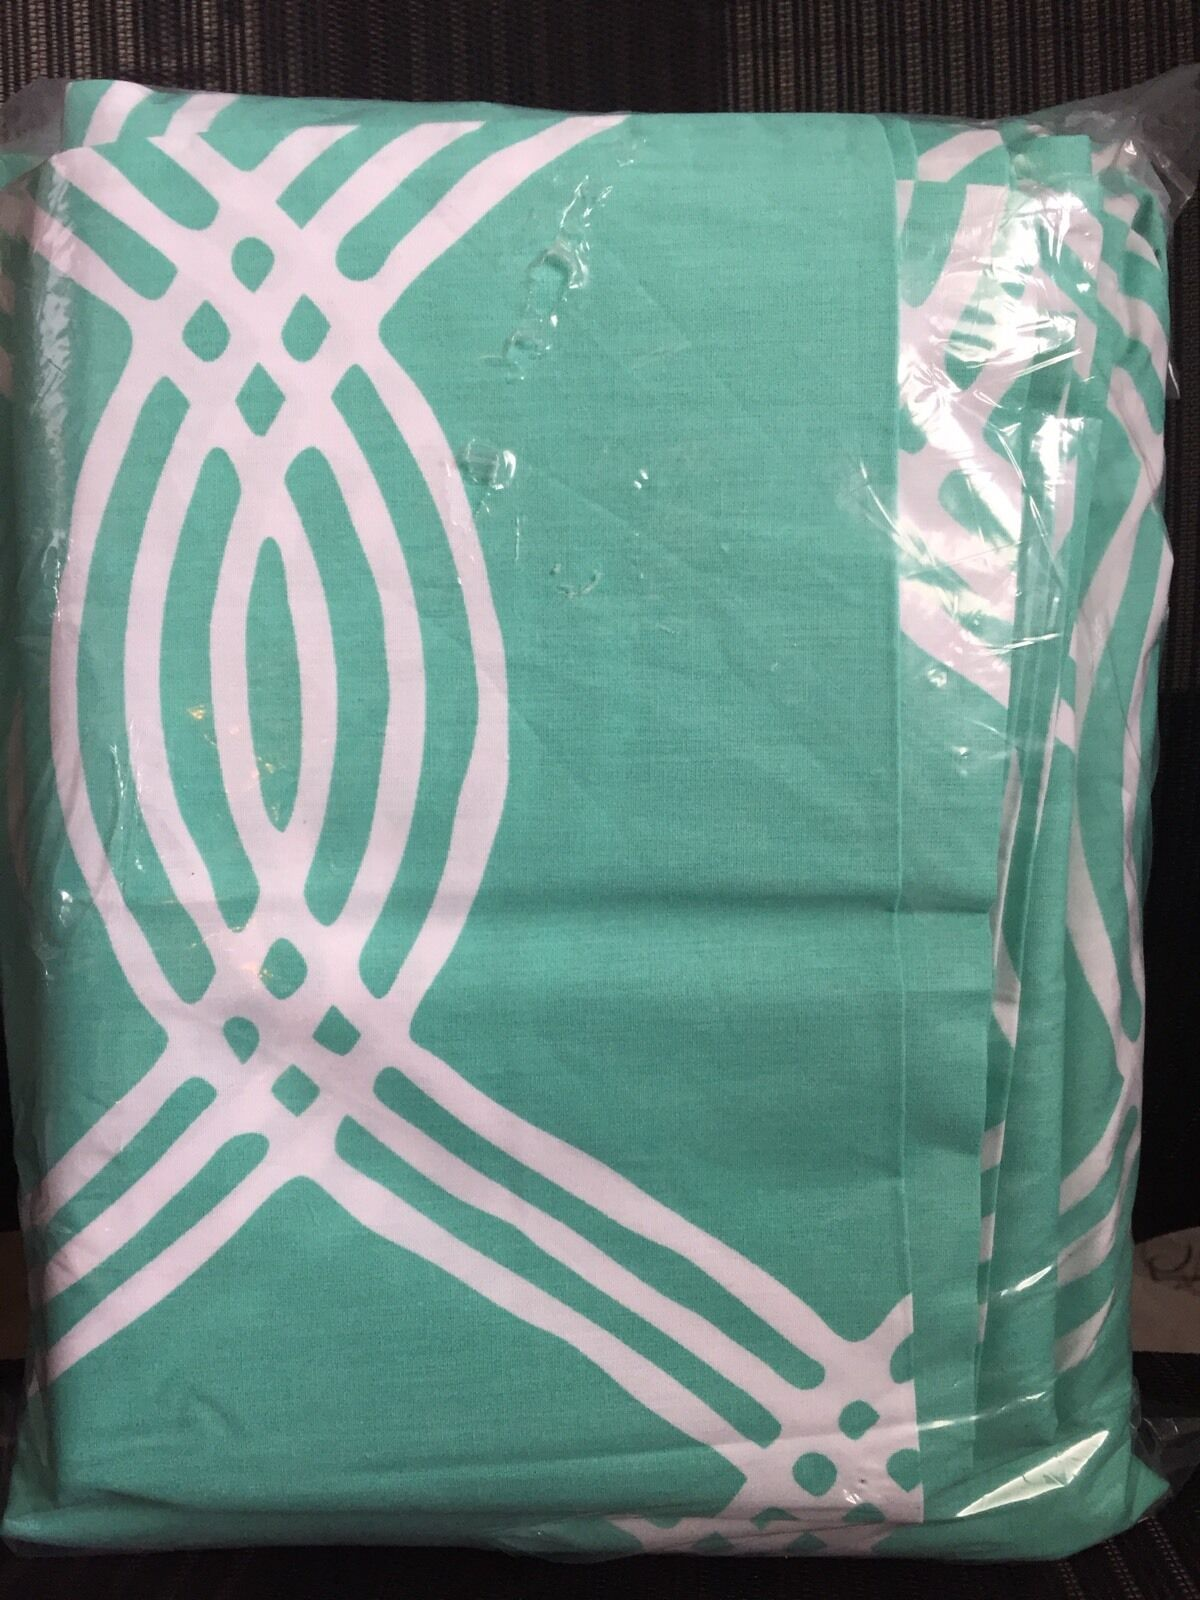 4 p Pottery Barn Teen Dorm Pool Blau Weiß Infinity Stripe Cotton Full Sheet Set